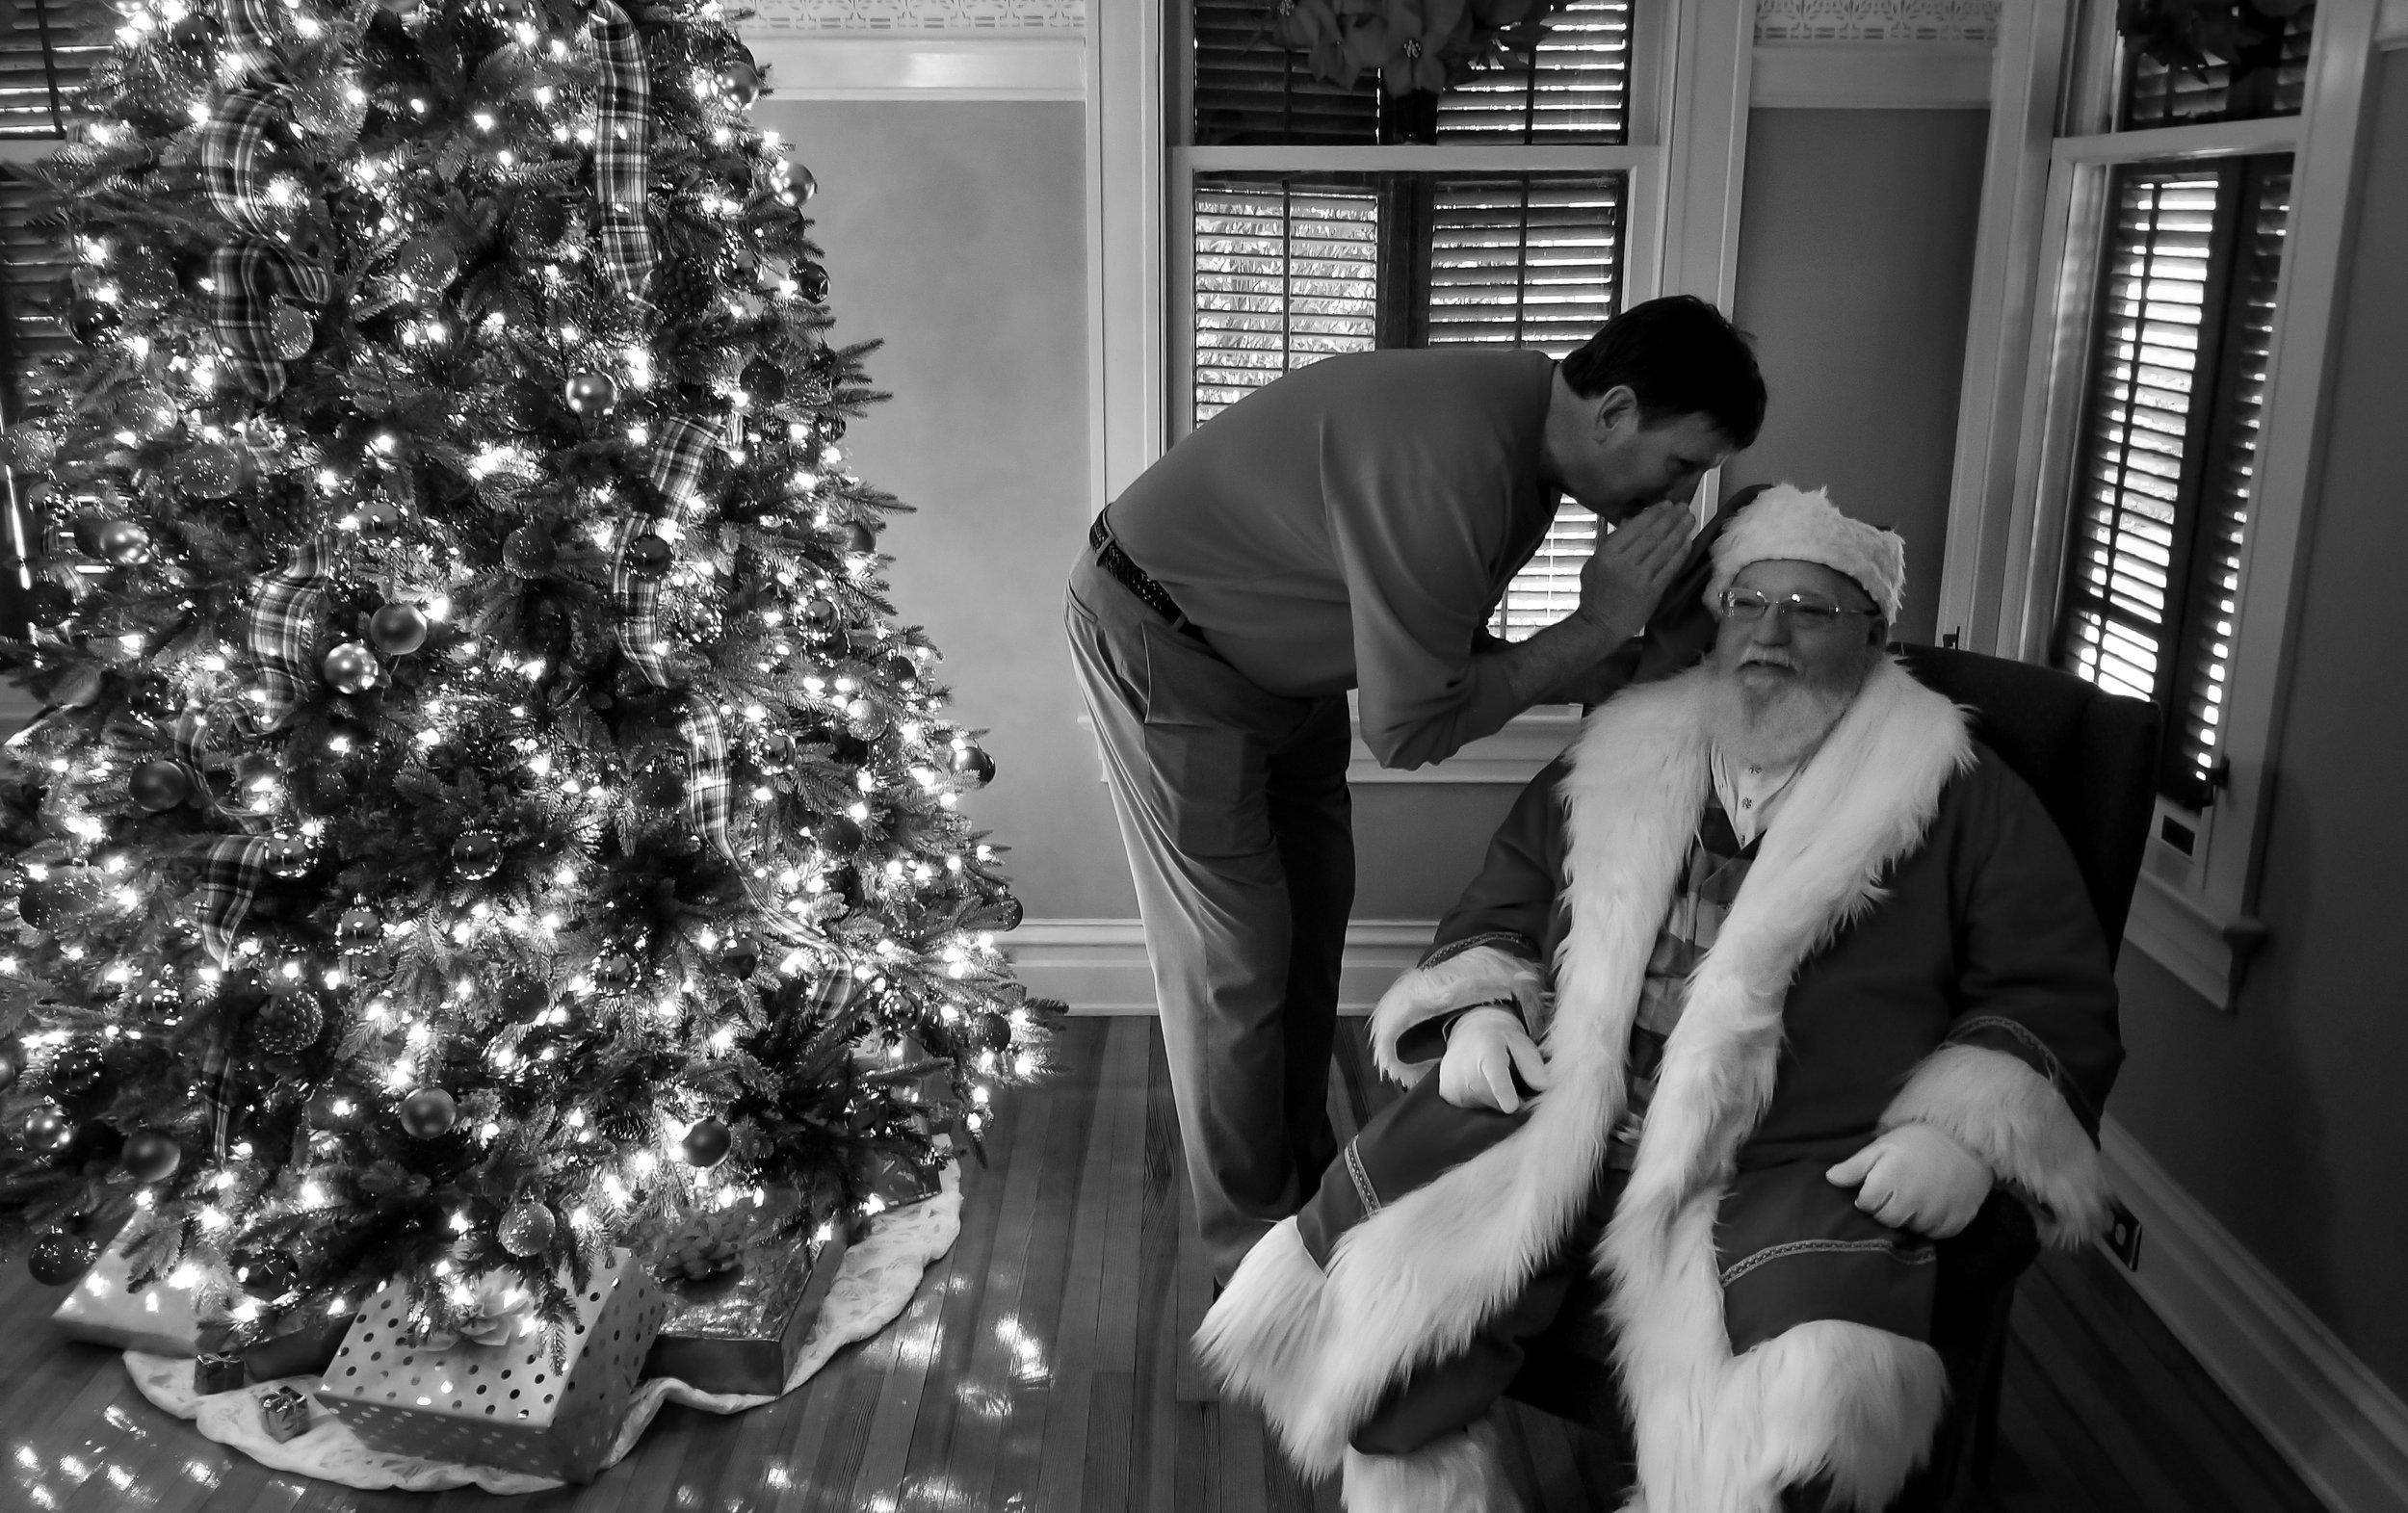 Mayor Alexander and Santa